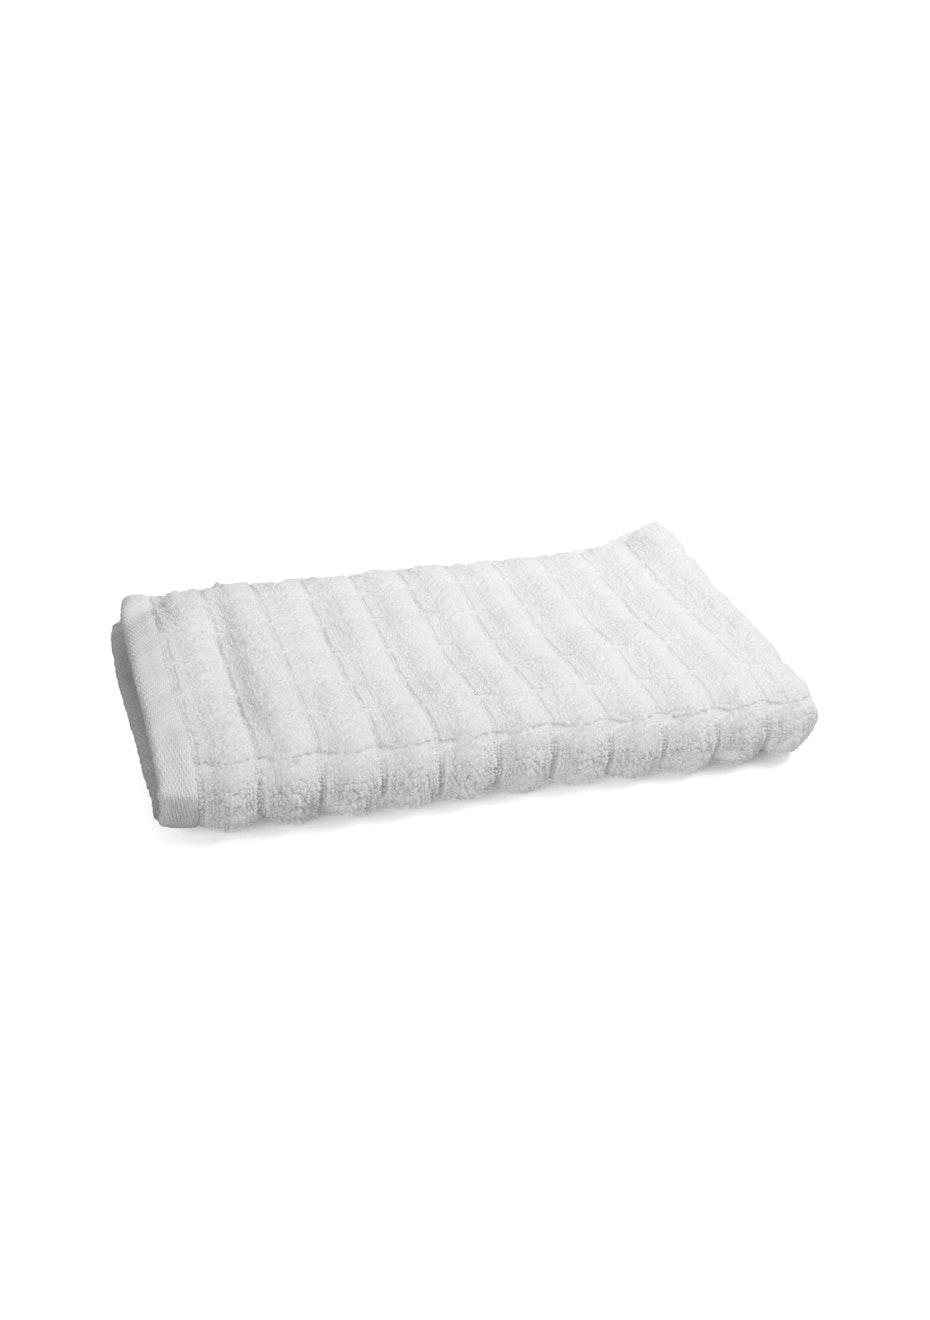 Conran Soho Hand Towel White